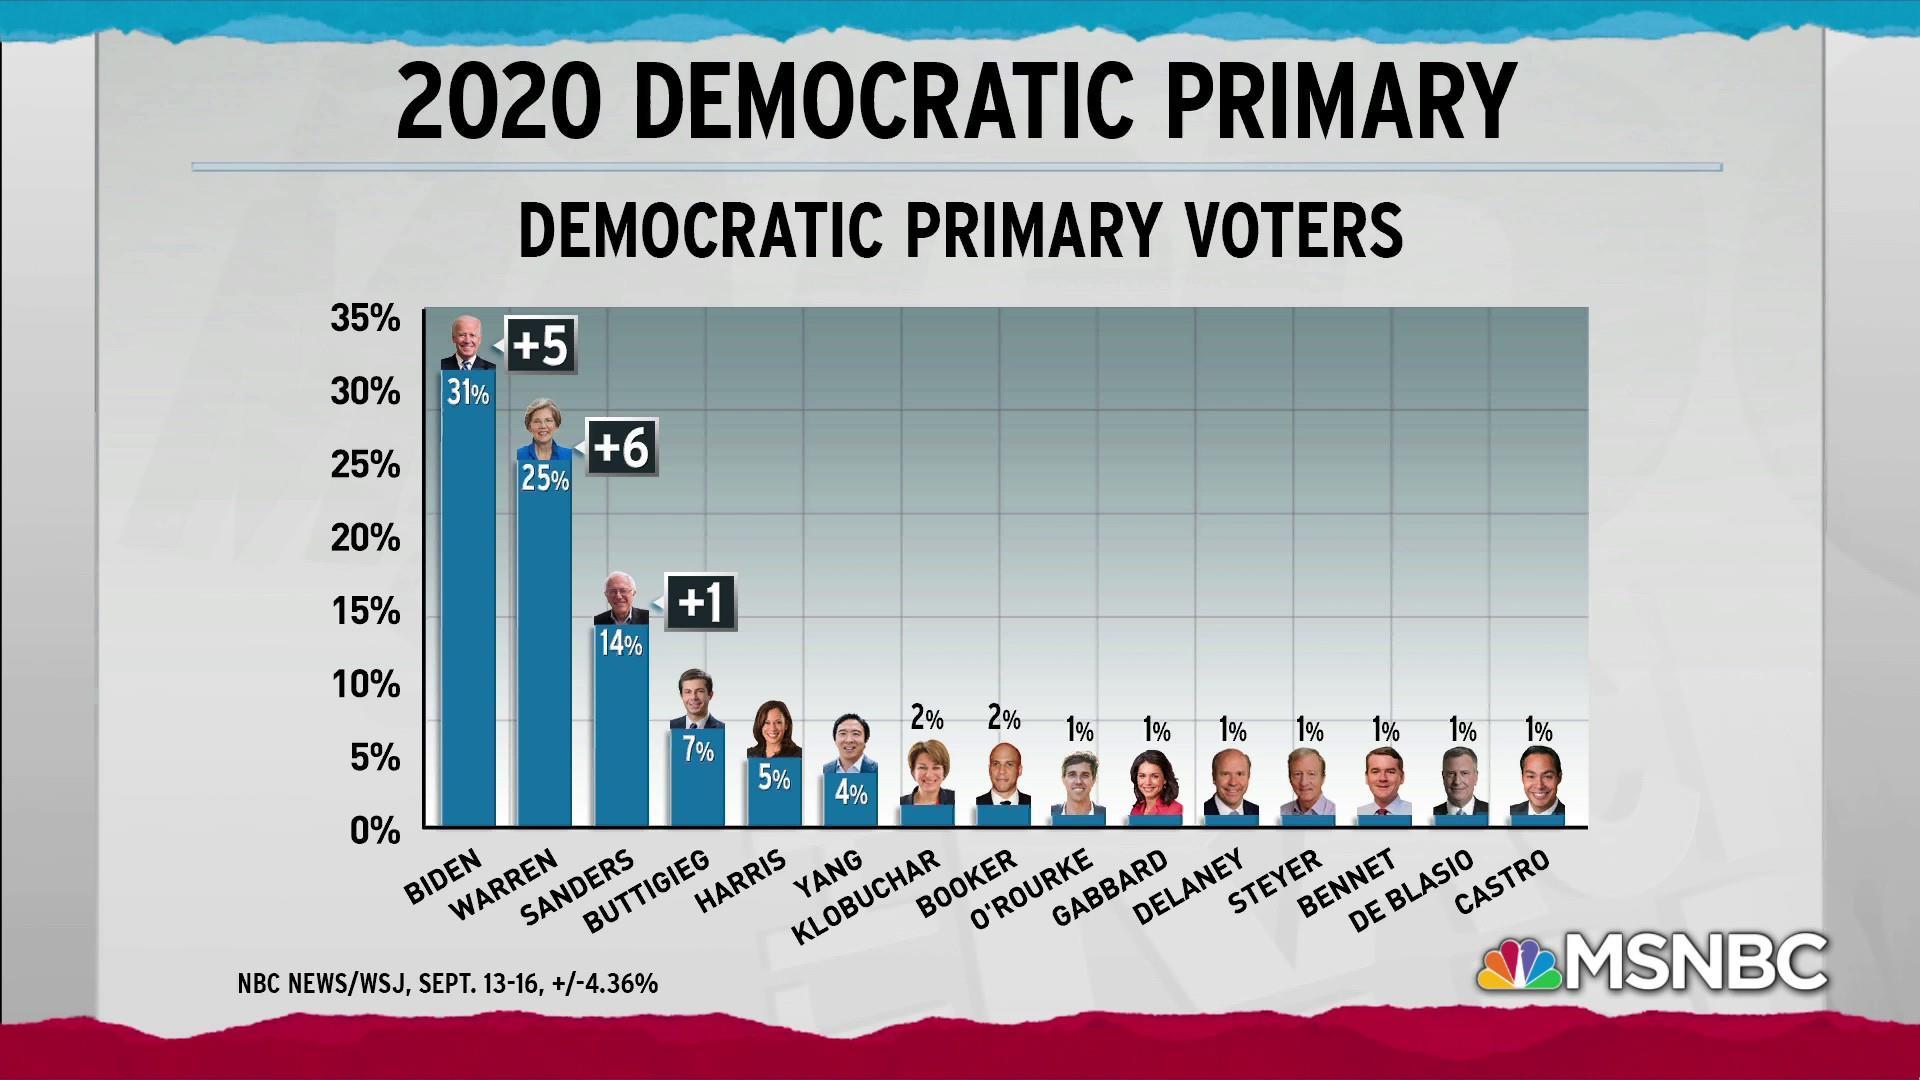 New post-debate poll shows boosts for Biden, Warren